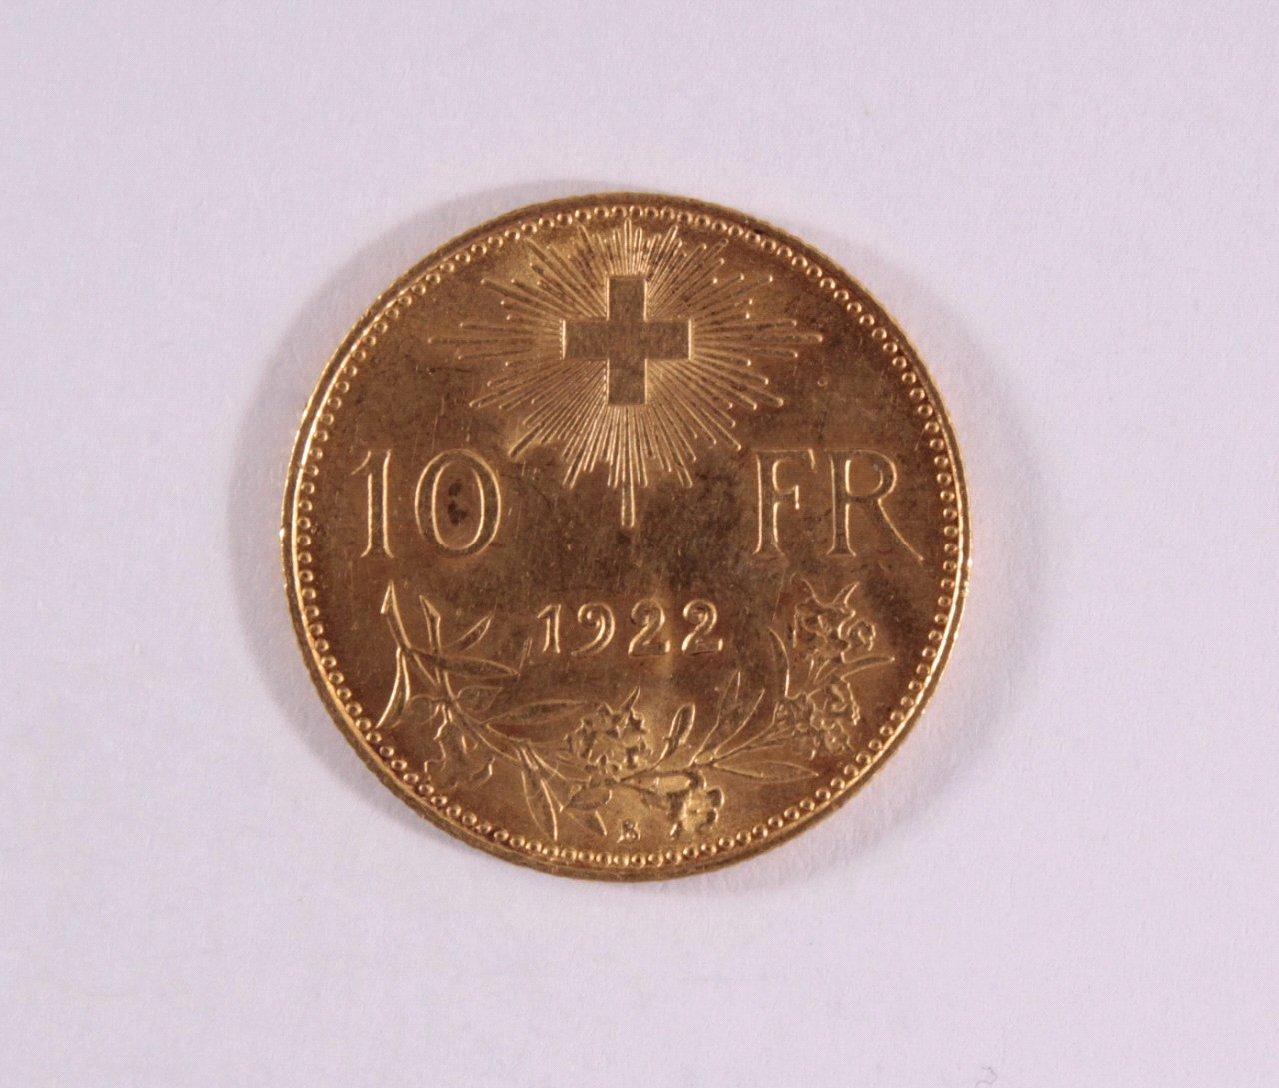 Schweiz, 10 Francs 1922-1